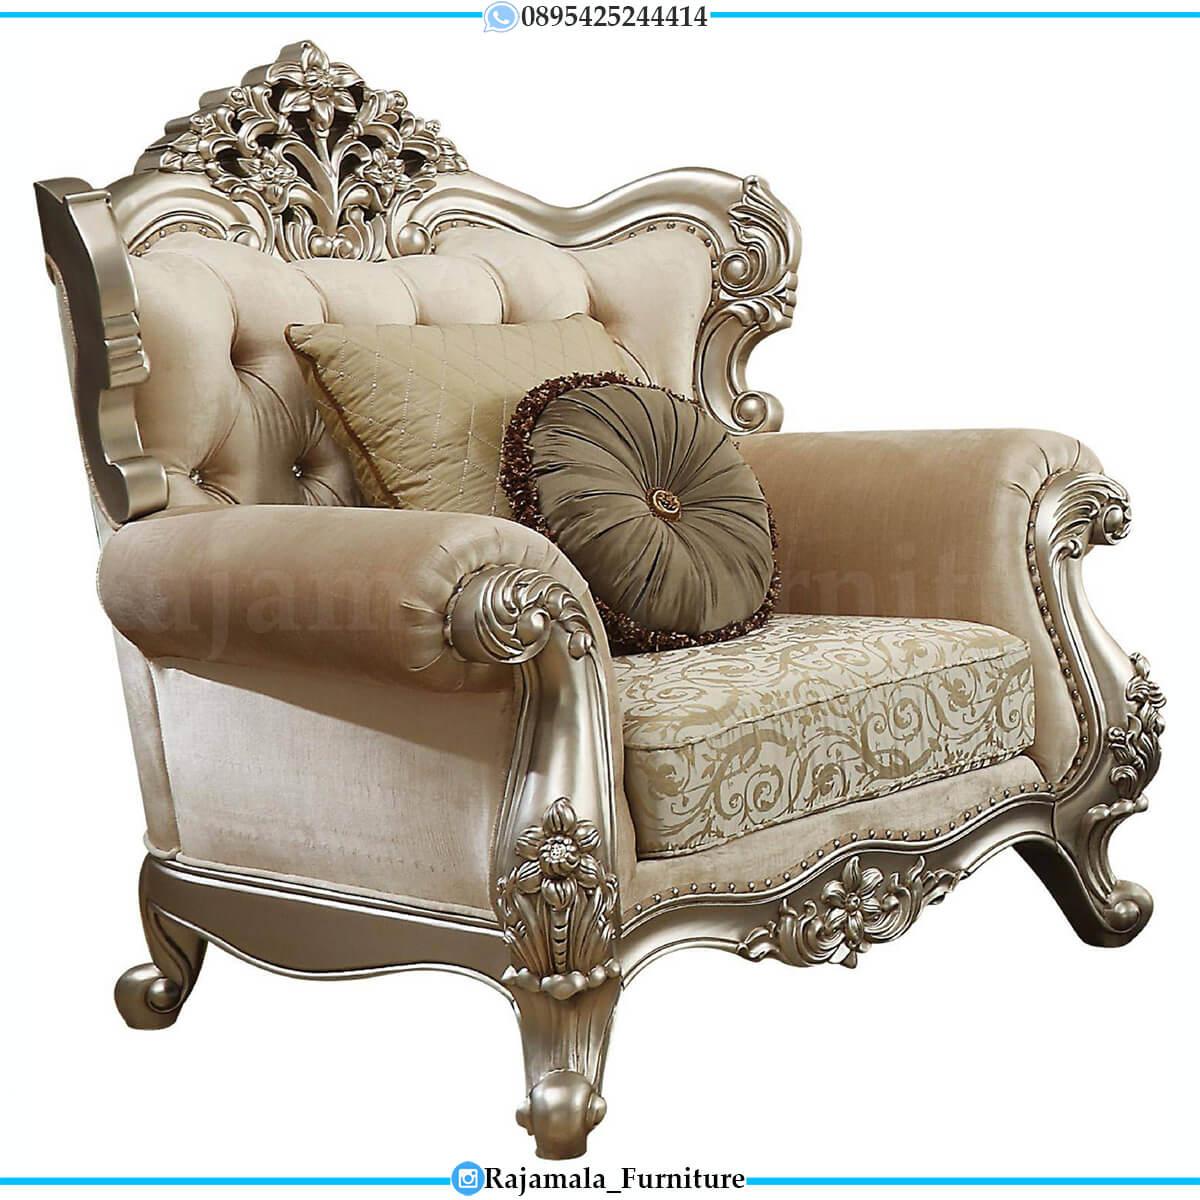 Sofa Tamu Mewah Silver Solid Excellent Art Duco Color RM-0730